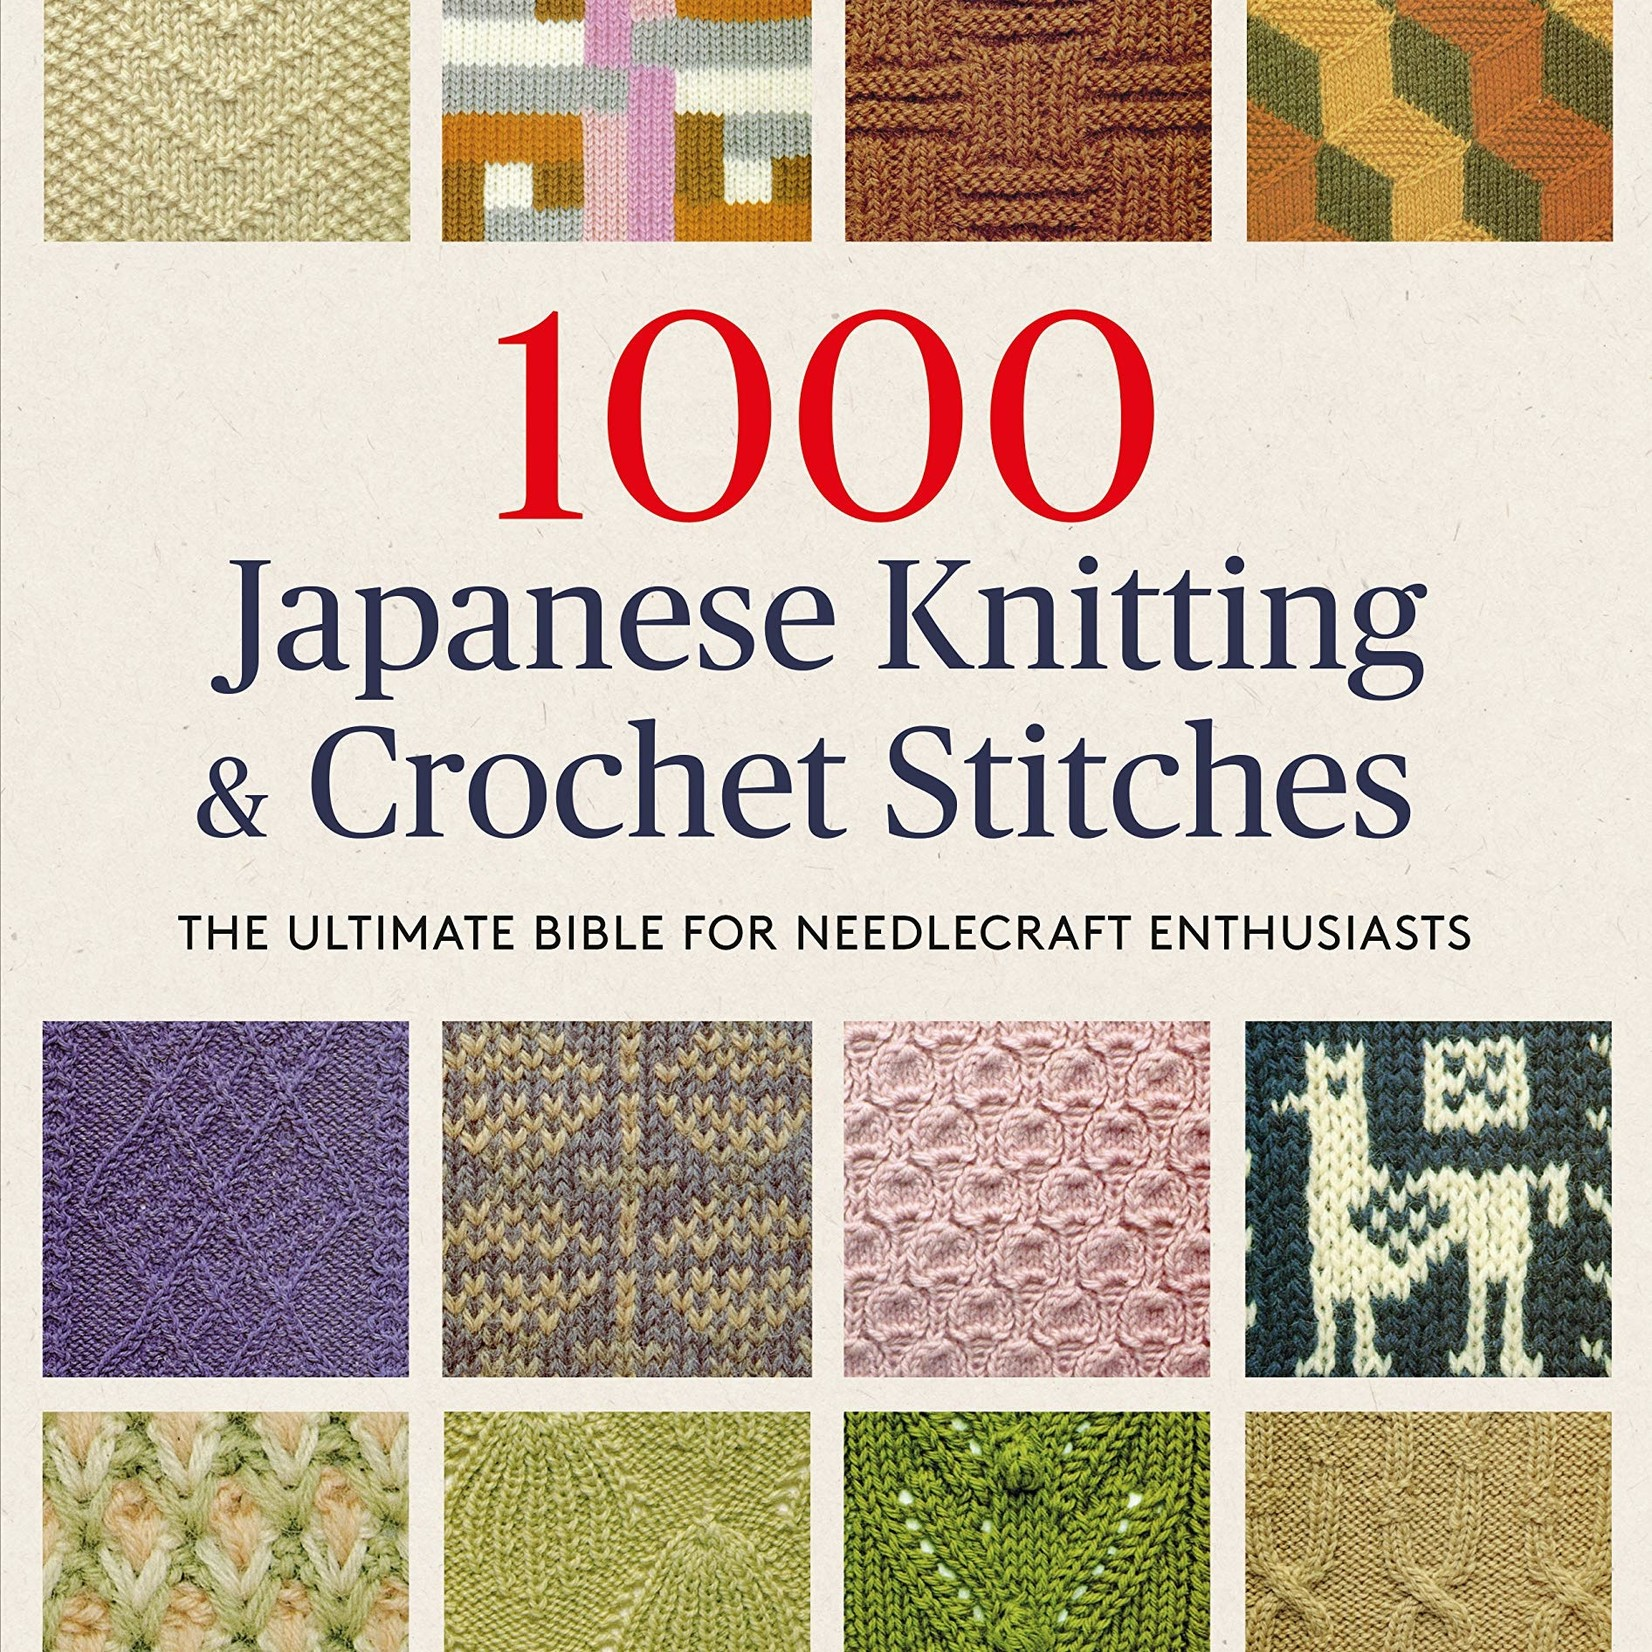 1000 Japanese Knitting and Crochet Stitches